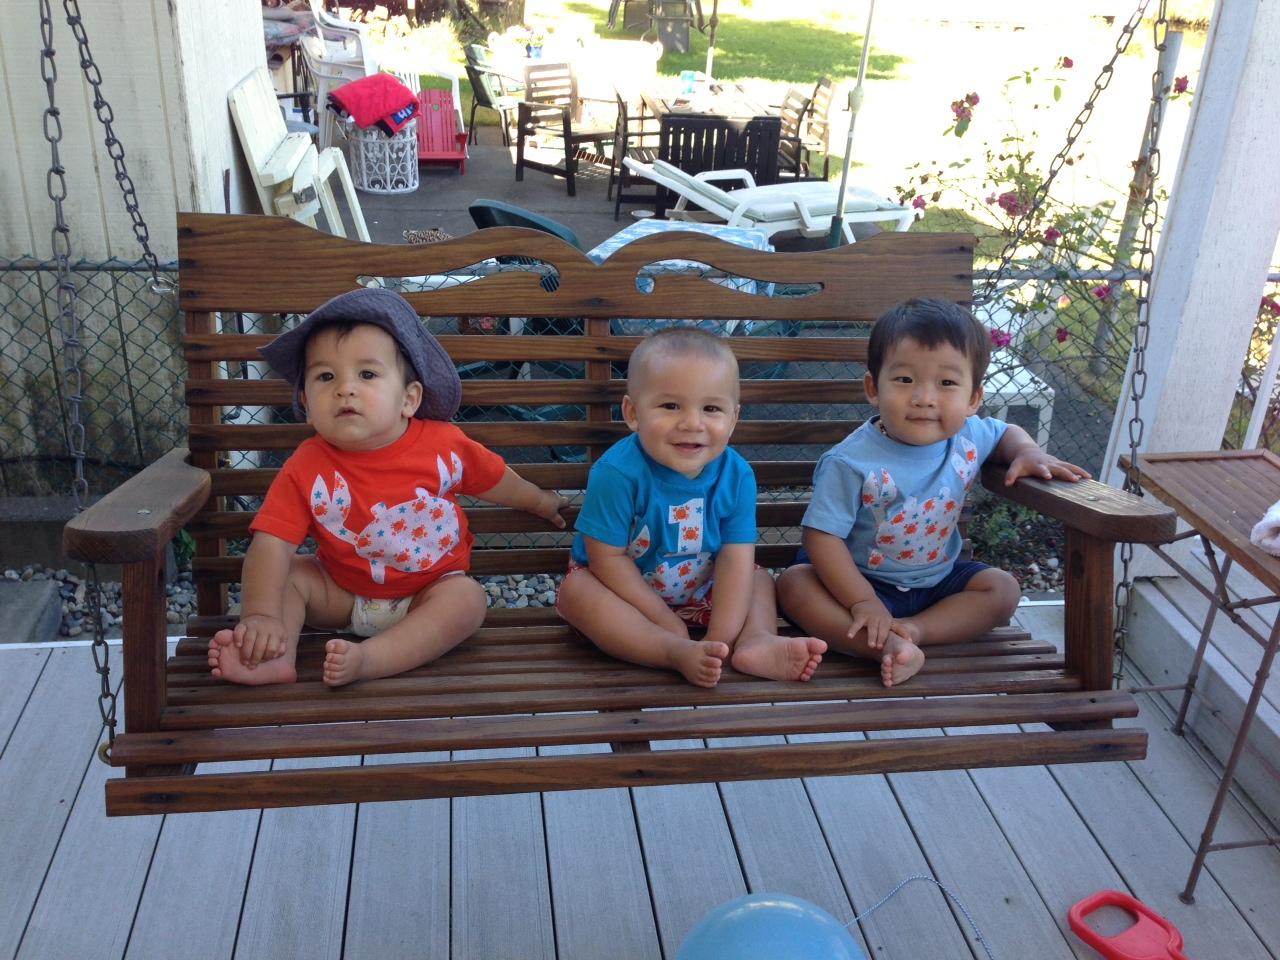 The boys in their Lilikoi Lane Crab shirts